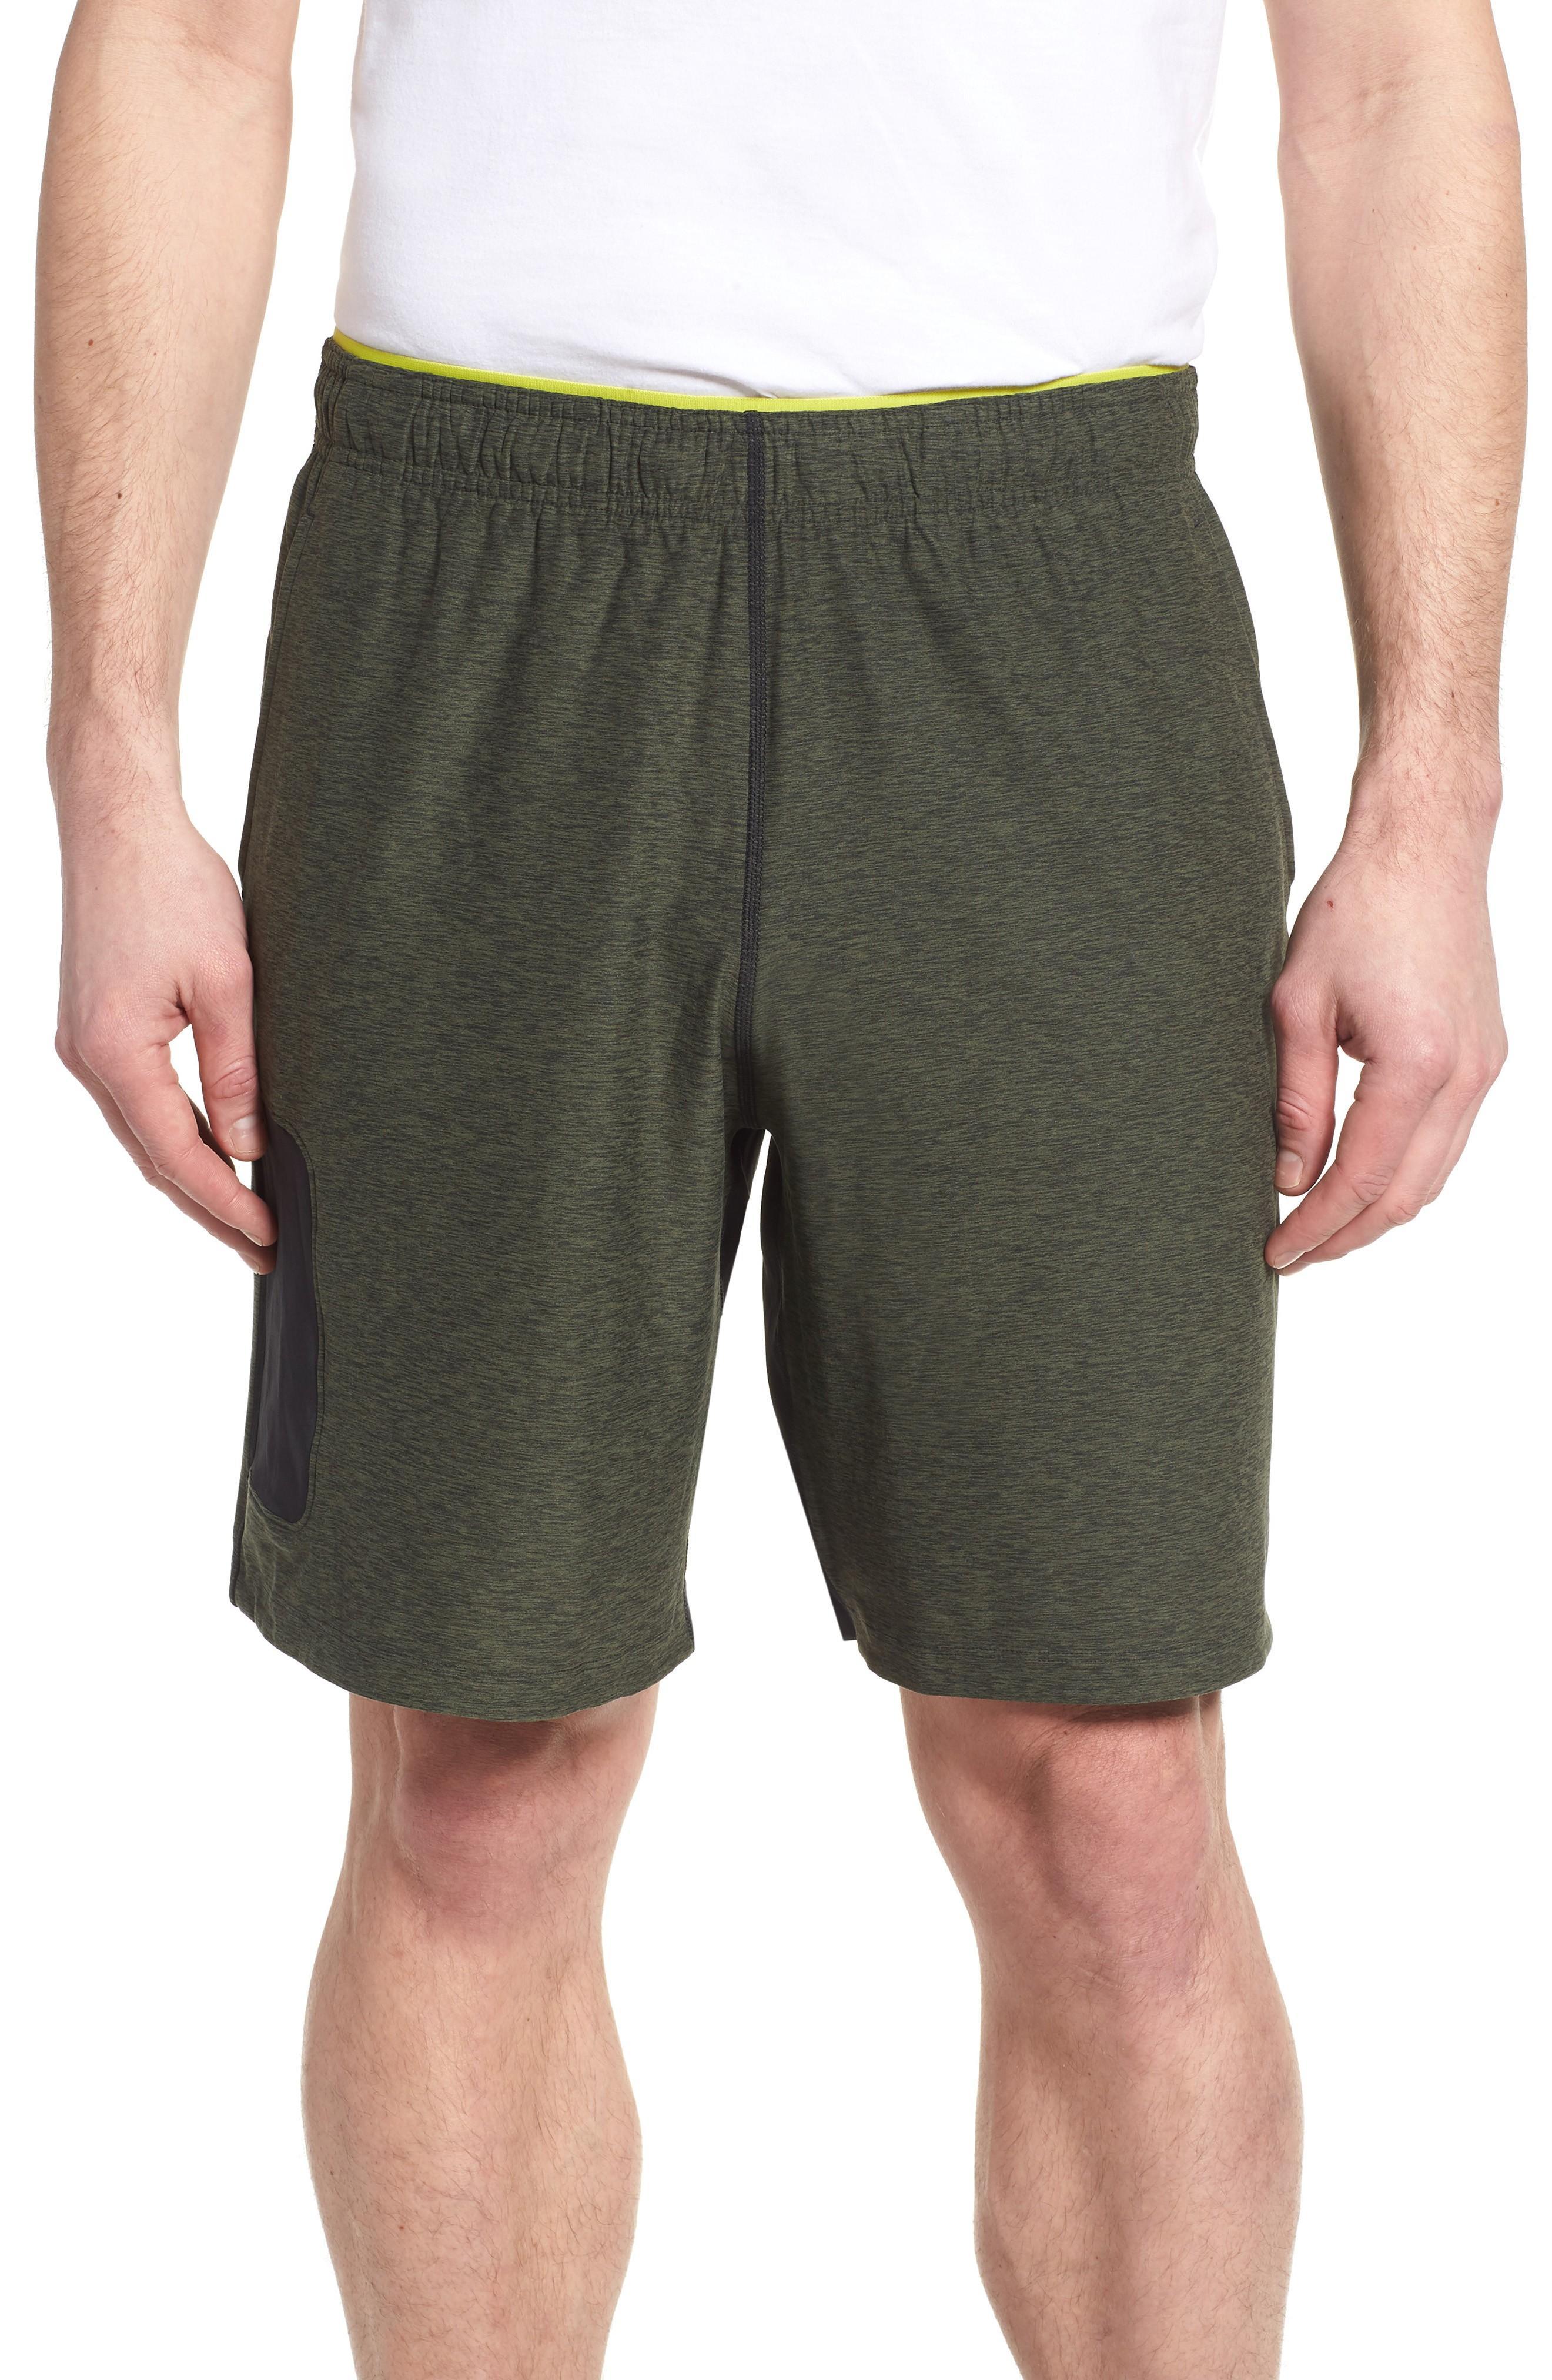 New Balance Anticipate Shorts In Dark Covert Green